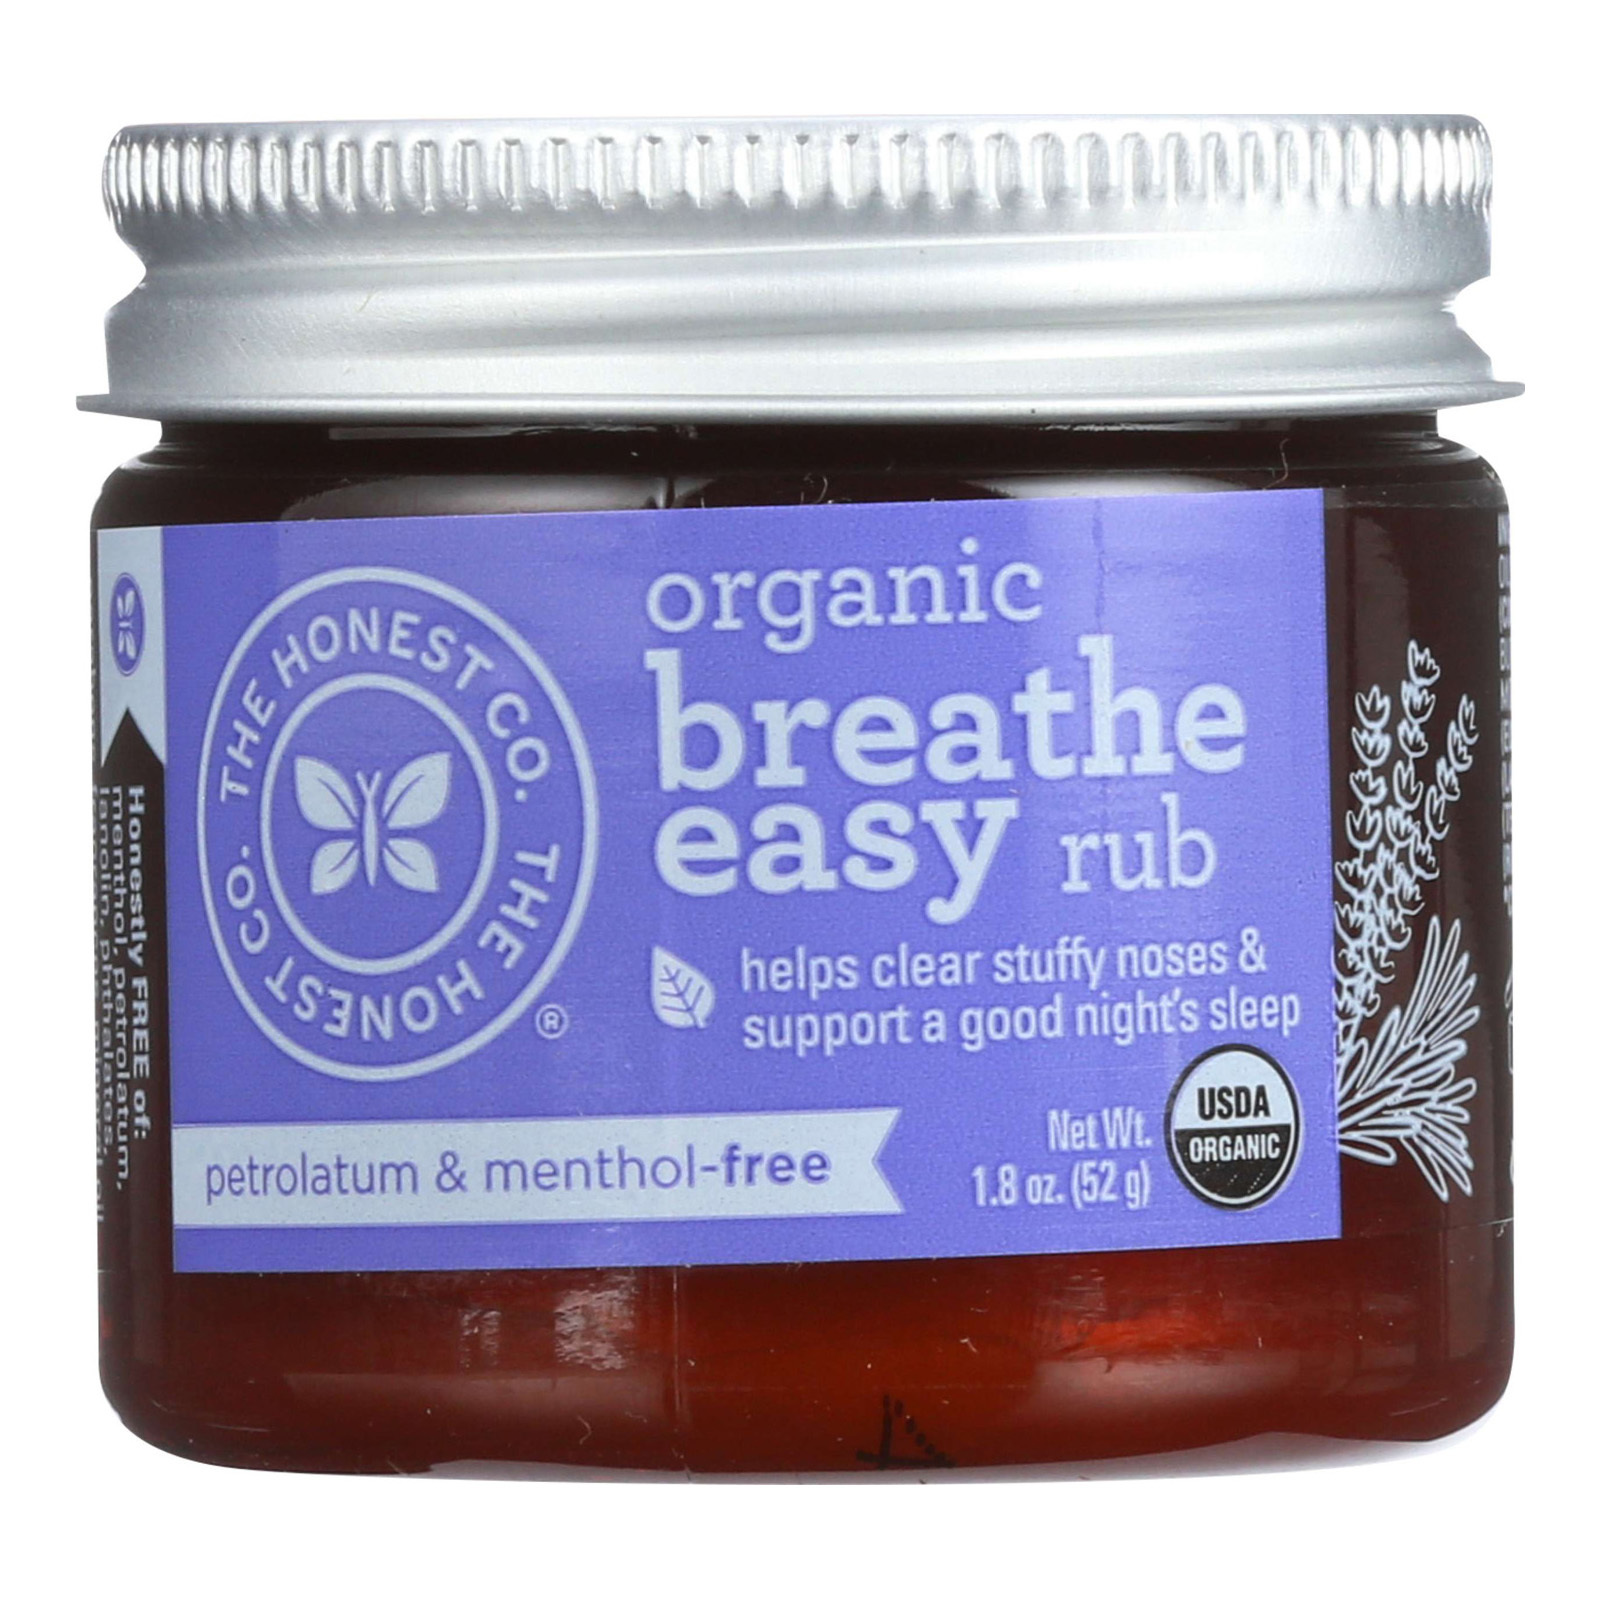 The Honest Company Organic Breathe Easy Rub - 1.8 oz